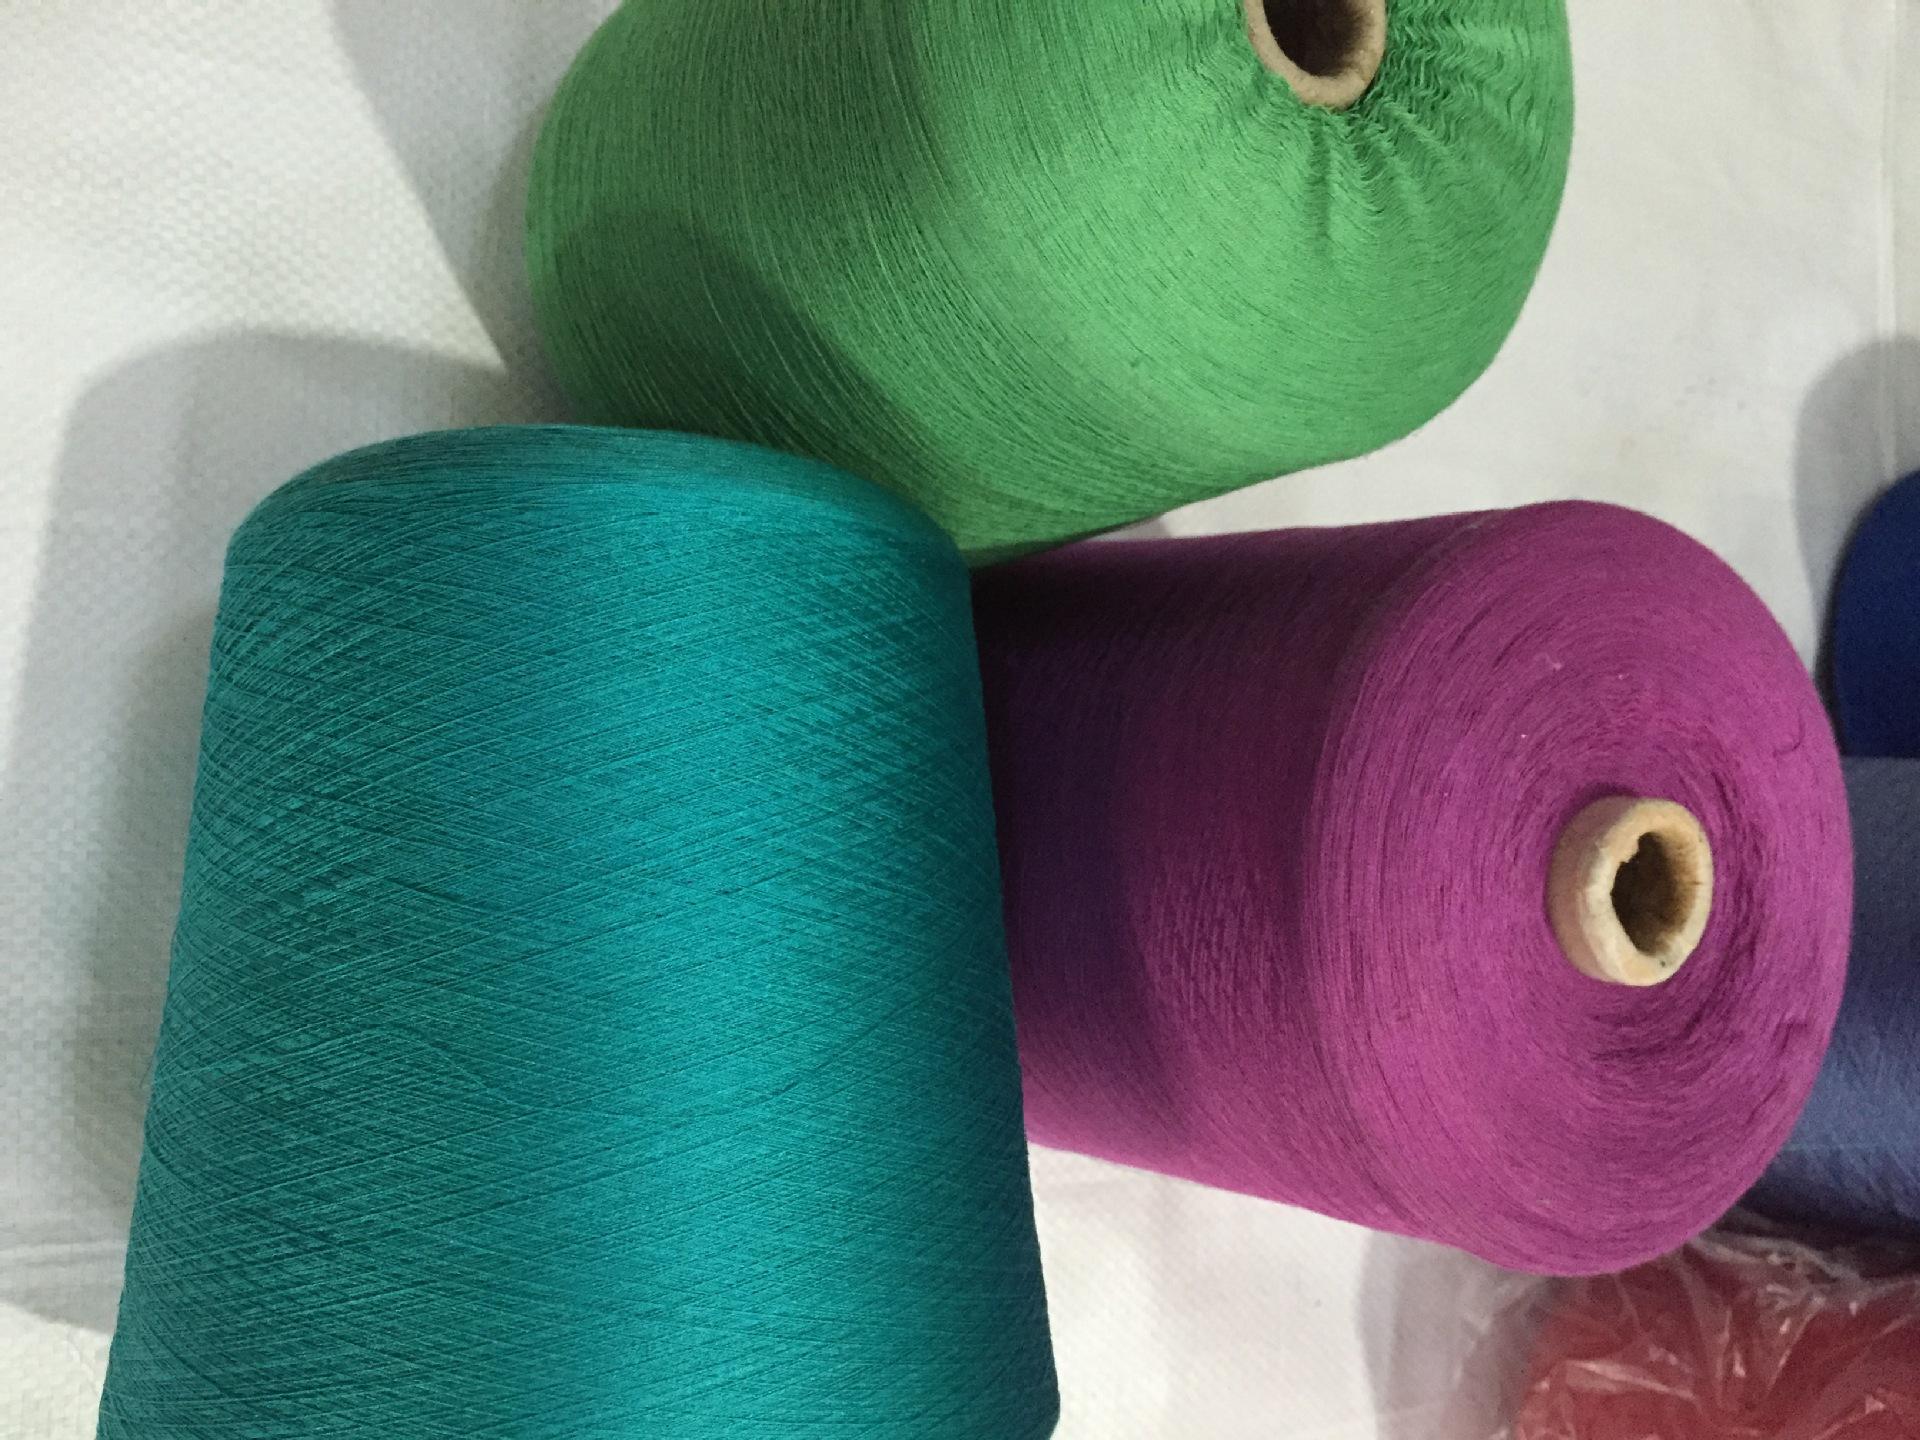 Jinyi Spun Silk High Quality Yarn 60 Count Spun Cotton Yarn 55 Spun Silk 45 Cotton Spun Silk Cotton